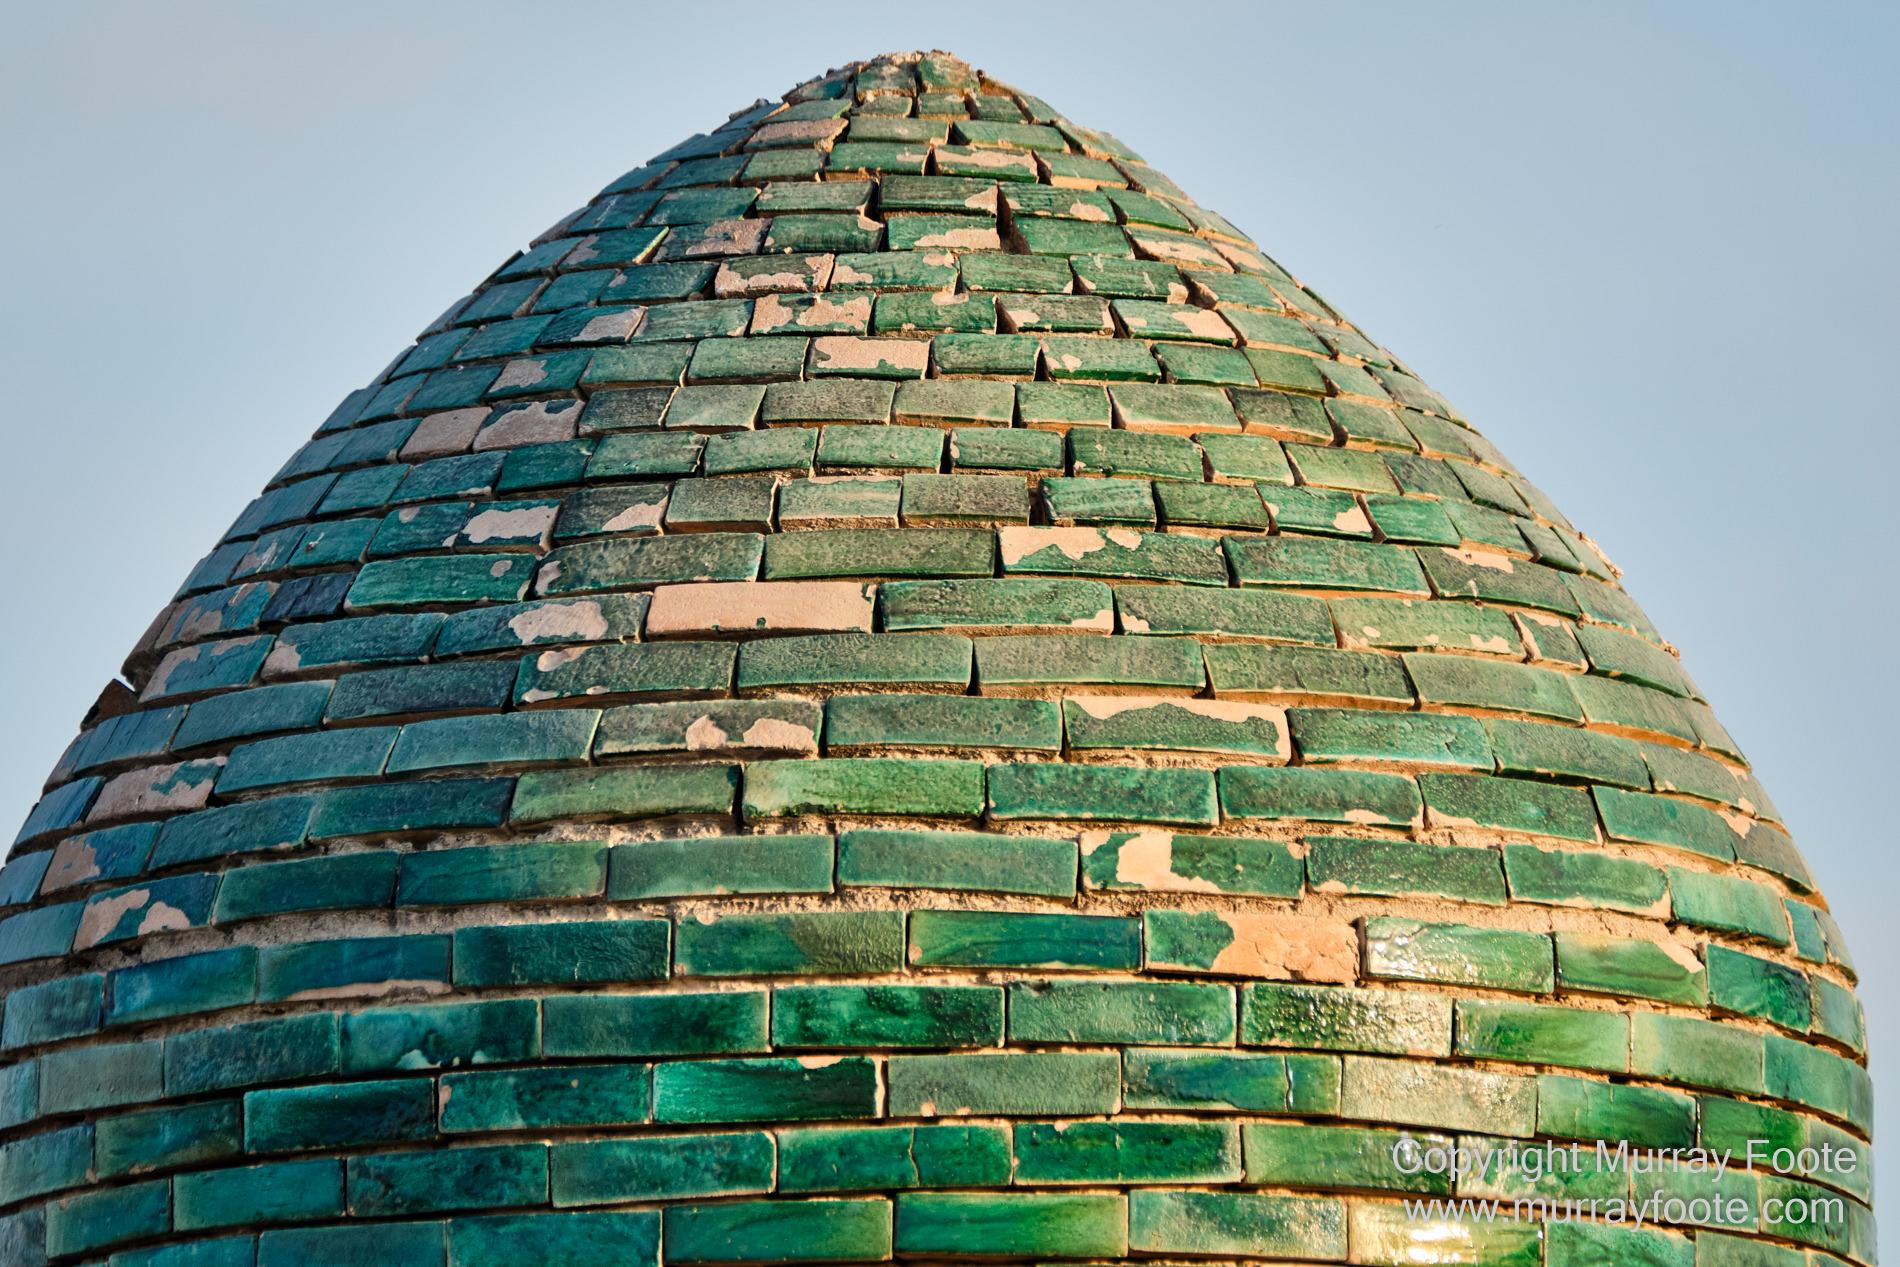 Architecture, Art, Ceramics, History, Khiva, Kukhna Ark, Landscape, Photography, Street photography, Travel, Uzbekistan